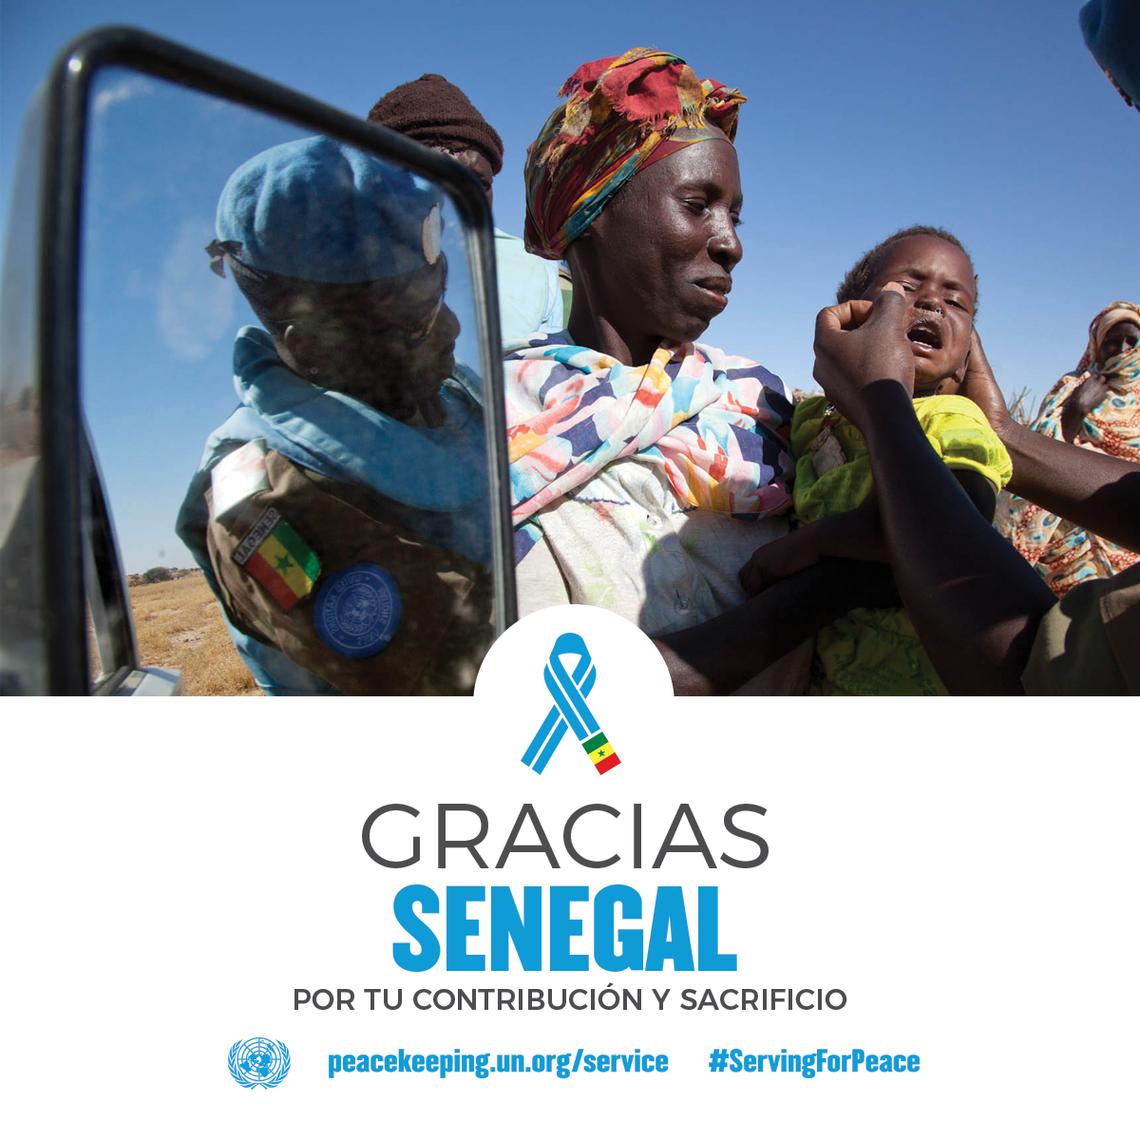 Gracias Senegal